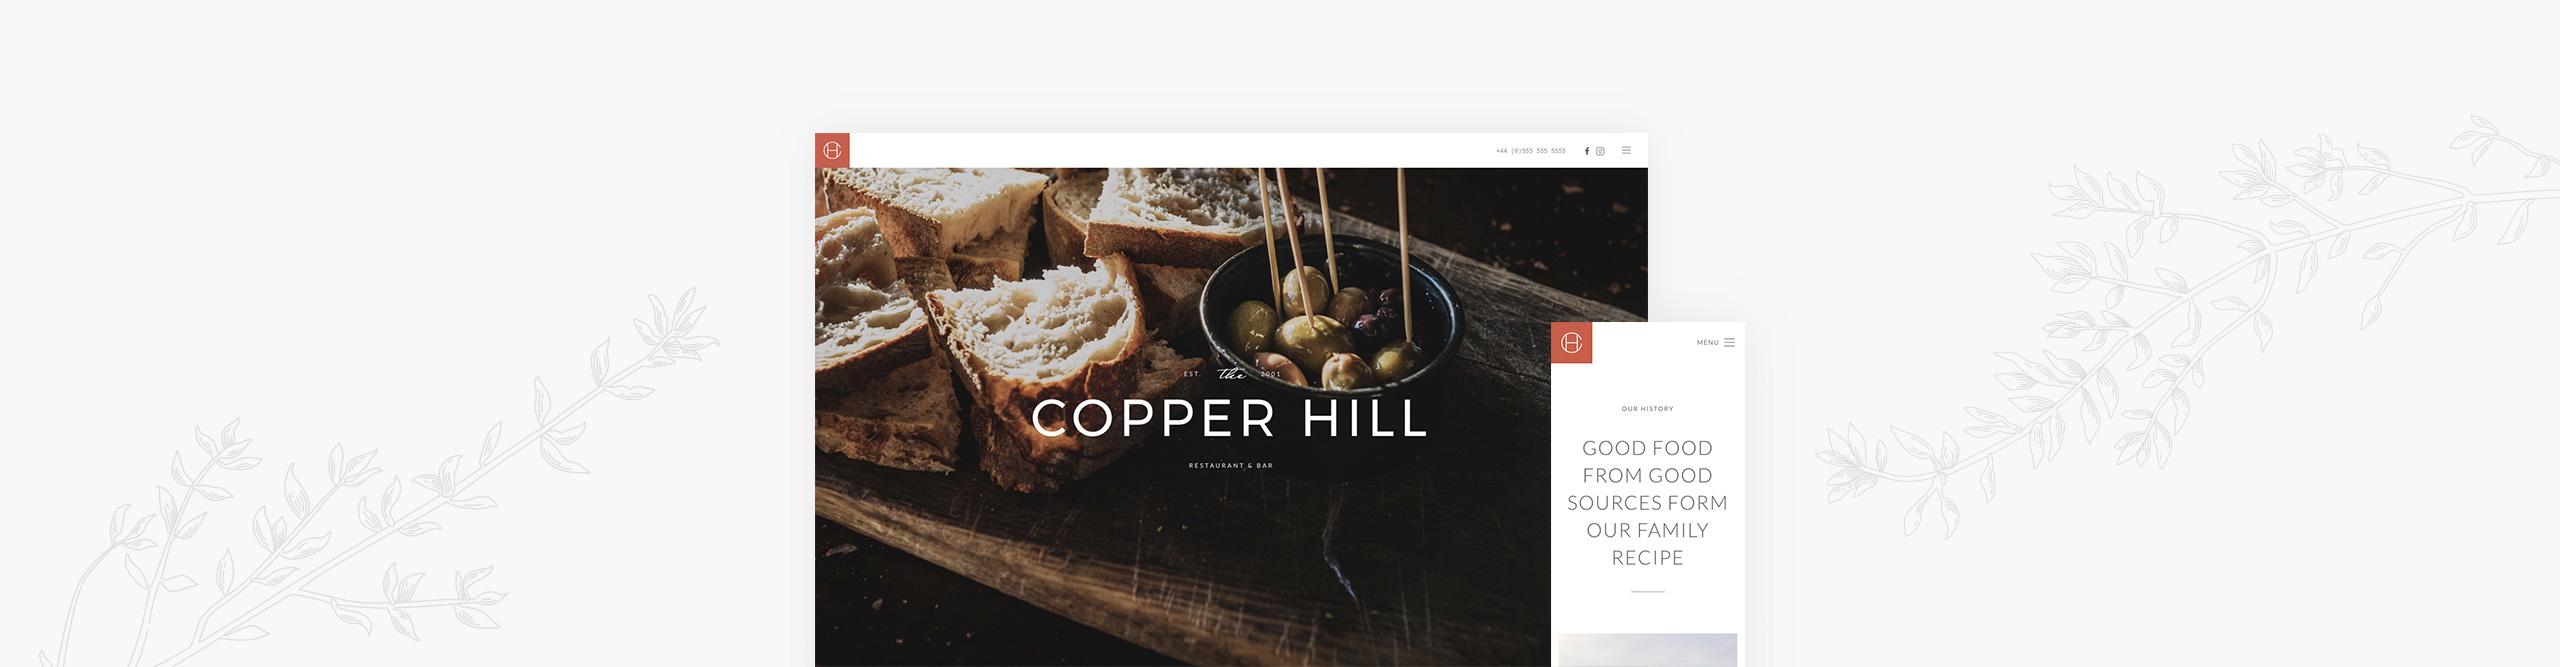 Copper Hill Theme for YOOtheme Pro - YOOtheme